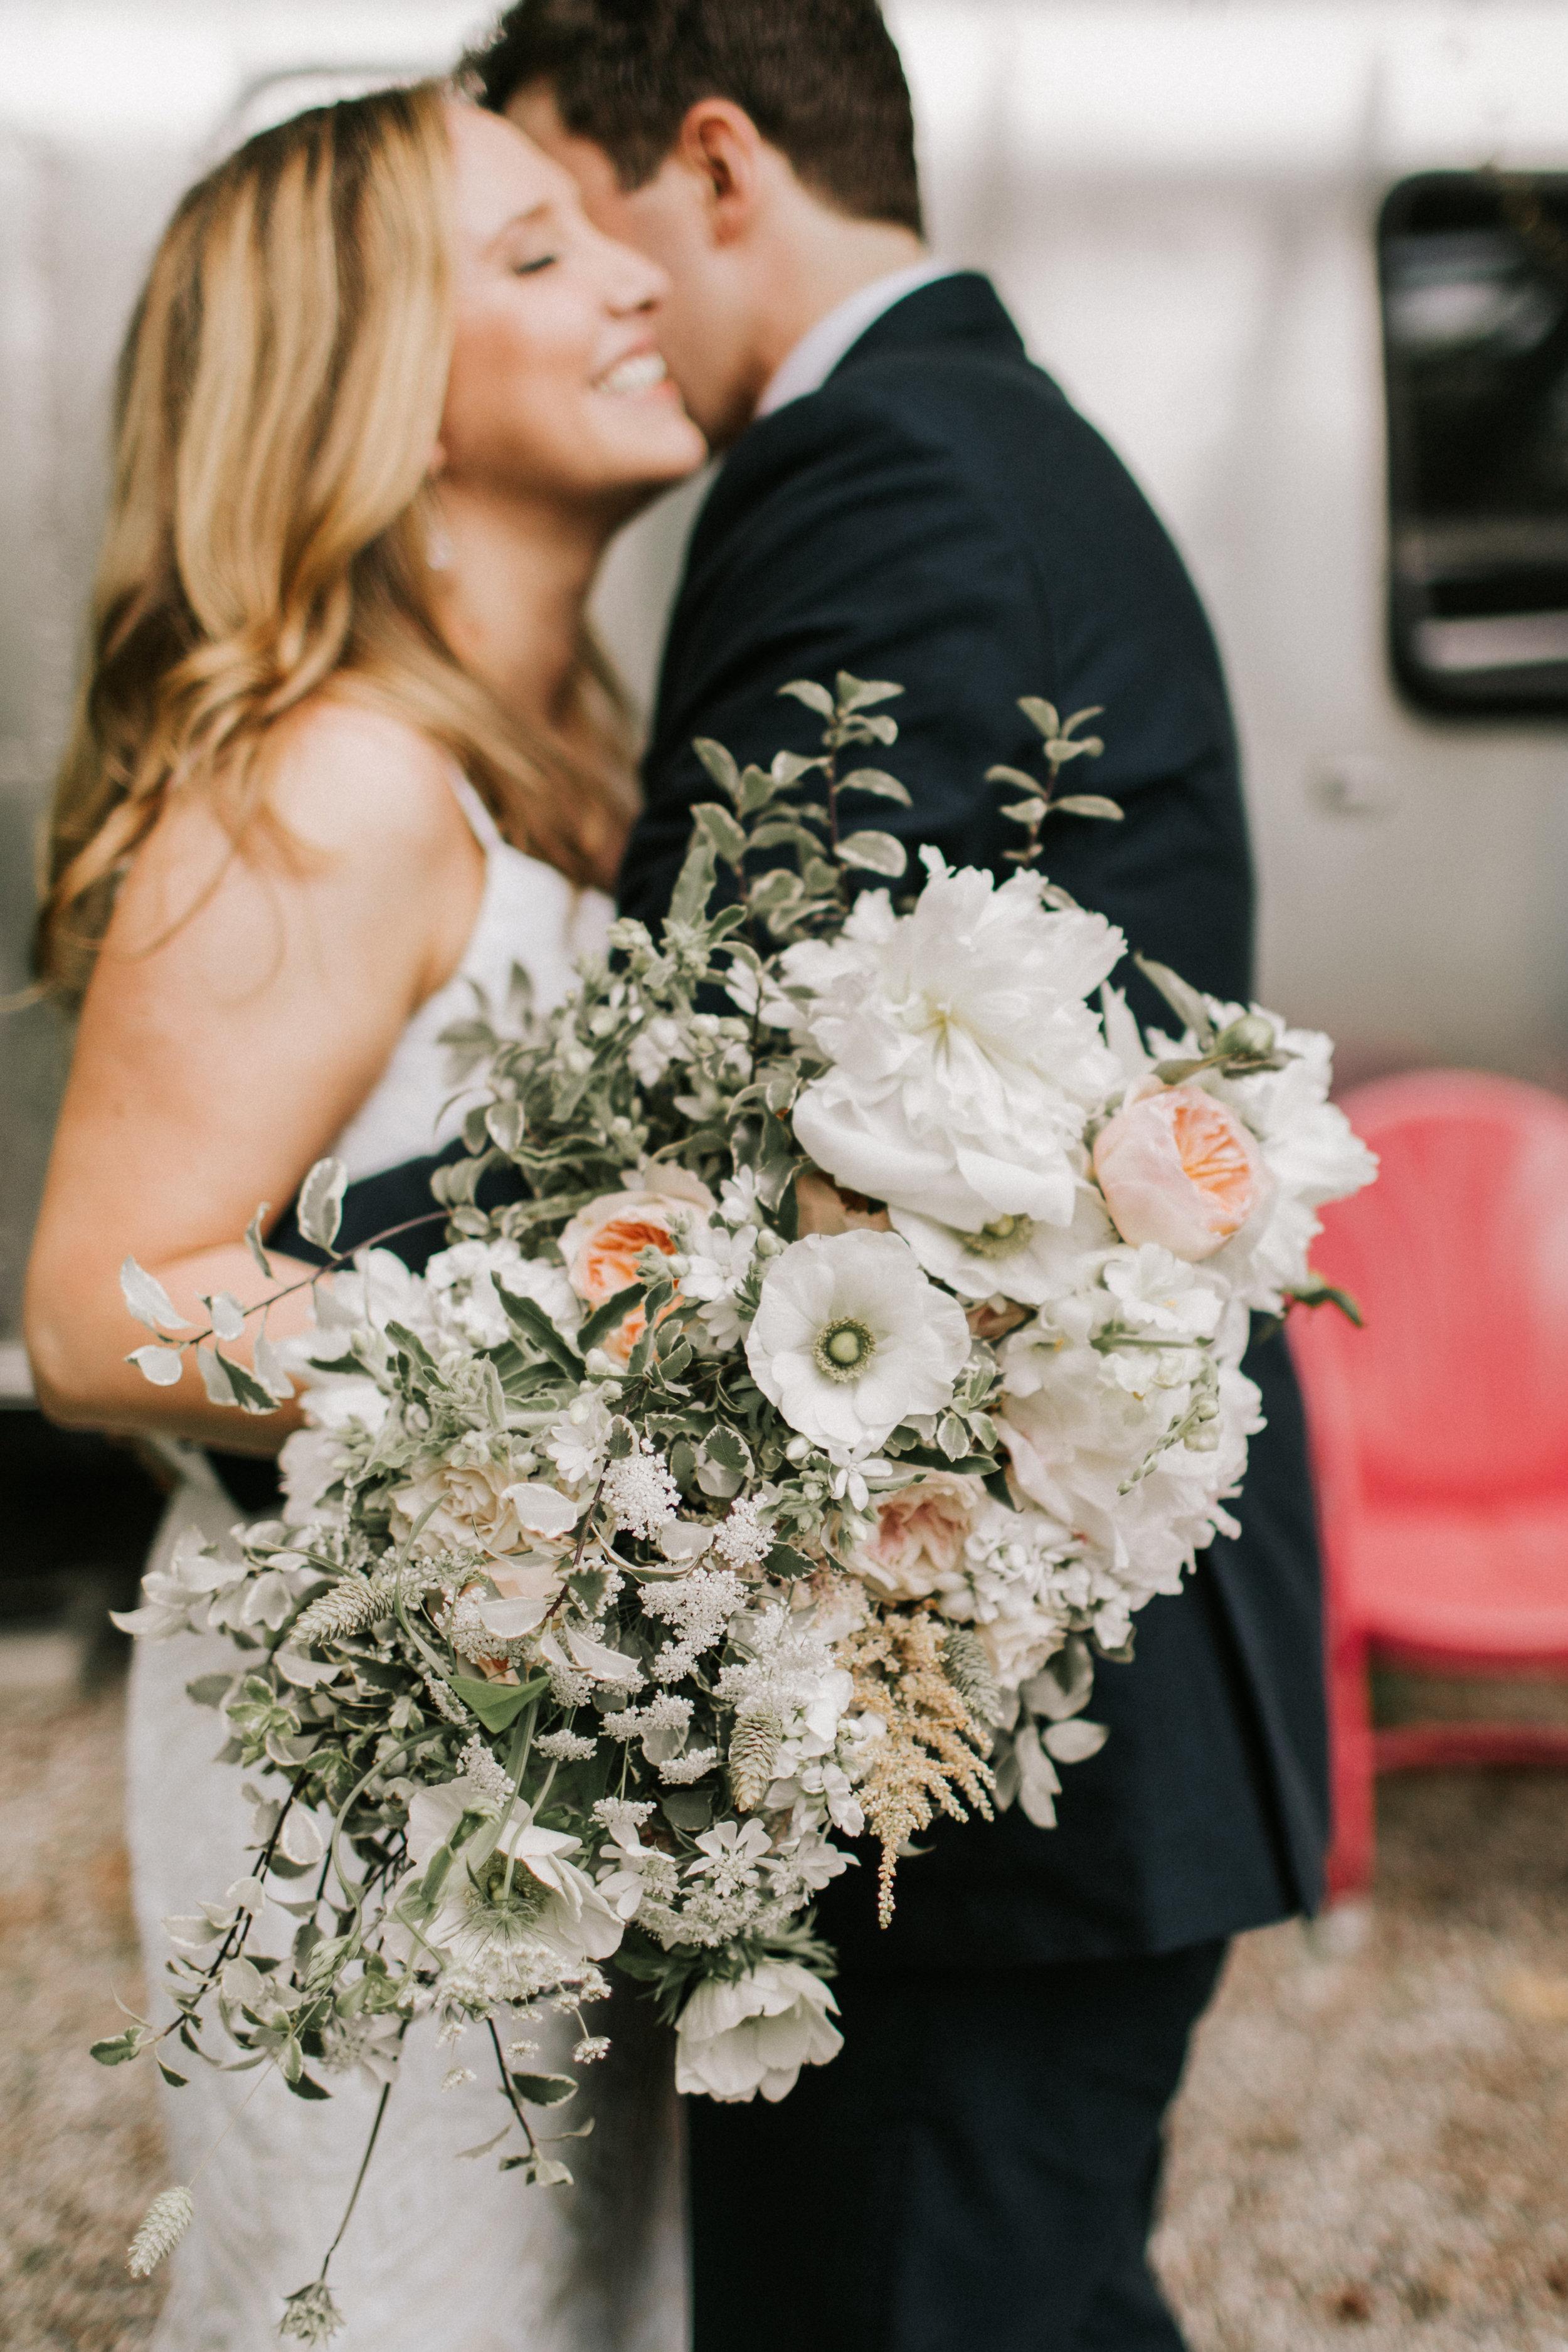 Watershed_Floral_Marianmade_Farm_Wedding_JamieMercurioPhoto2018-113.jpg